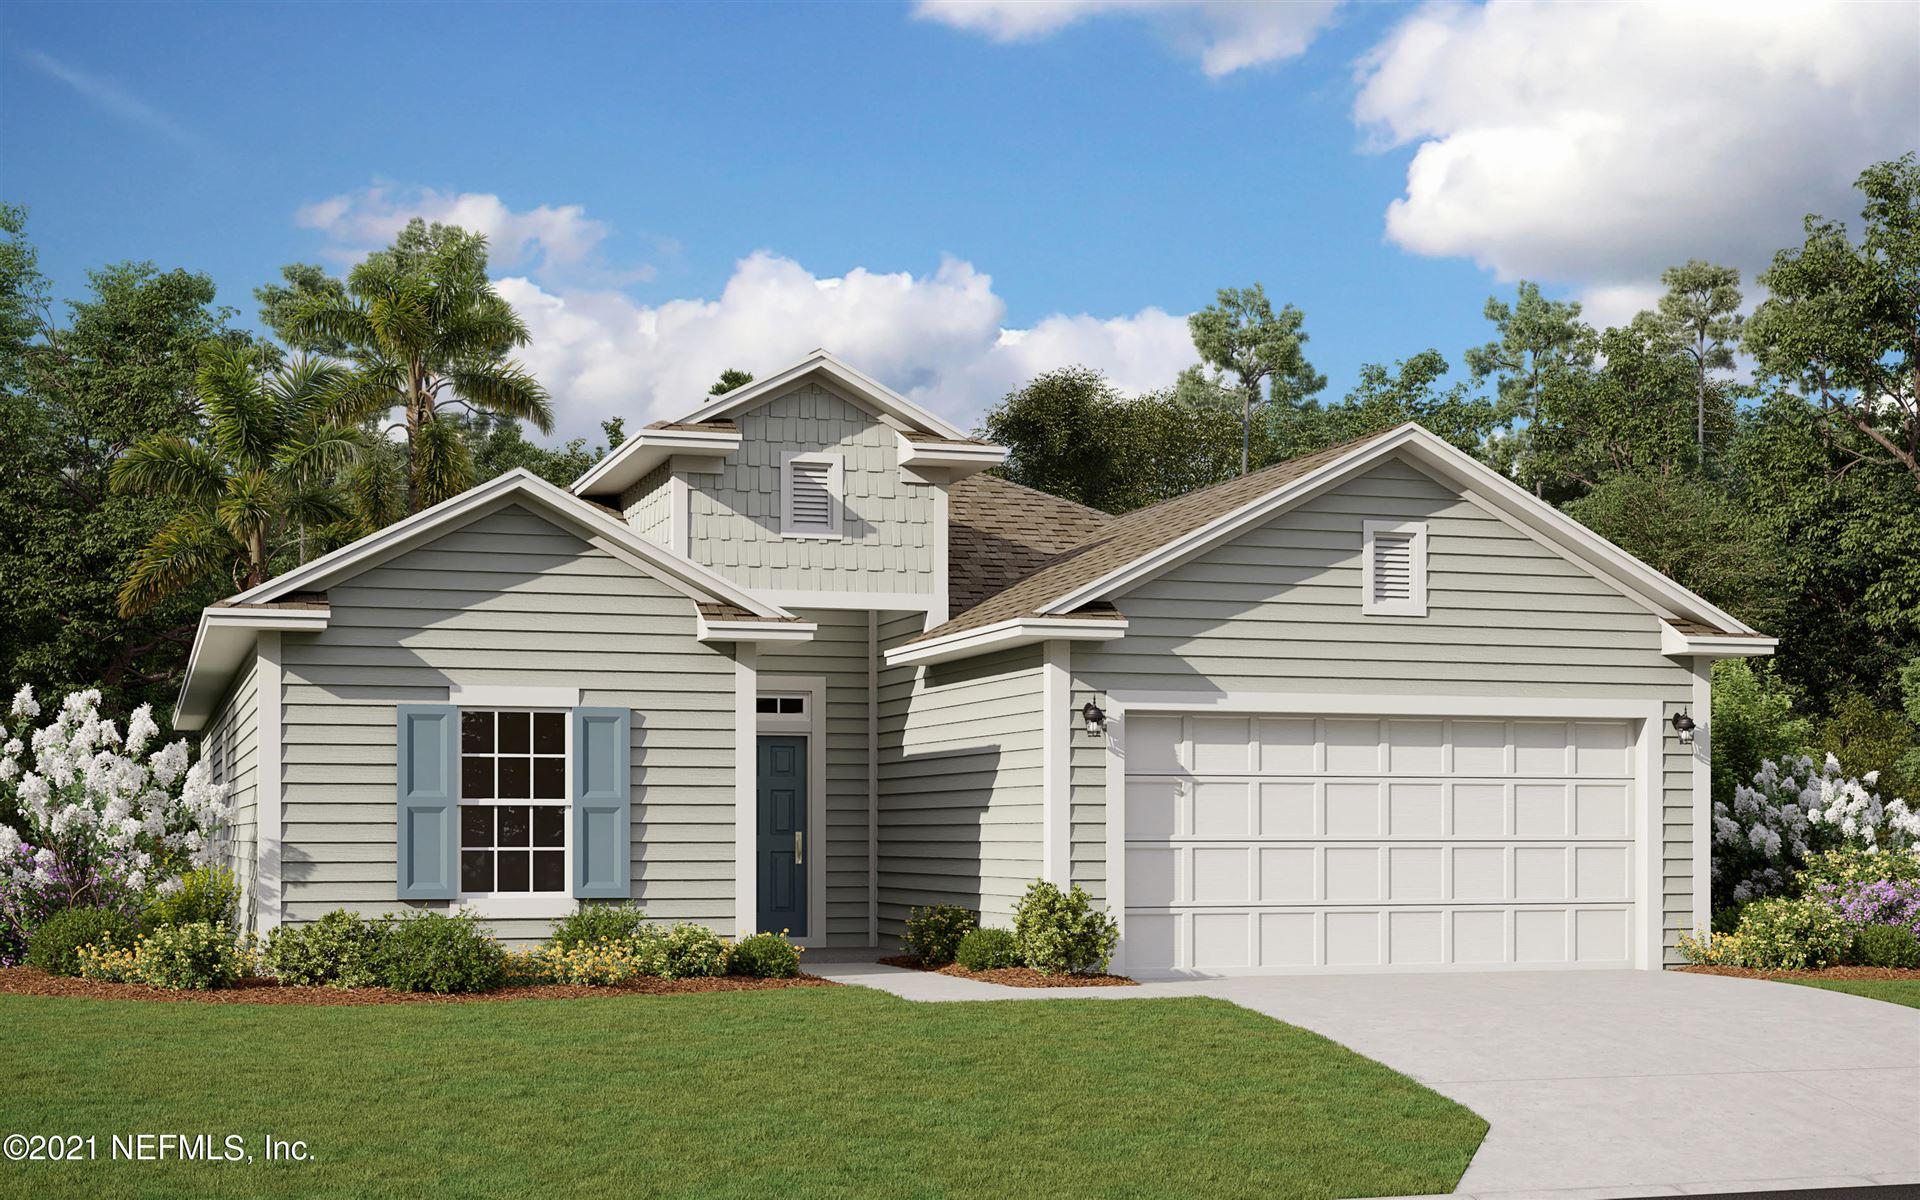 2849 COPPERWOOD AVE #Lot No: 067, Orange Park, FL 32073 - MLS#: 1097567